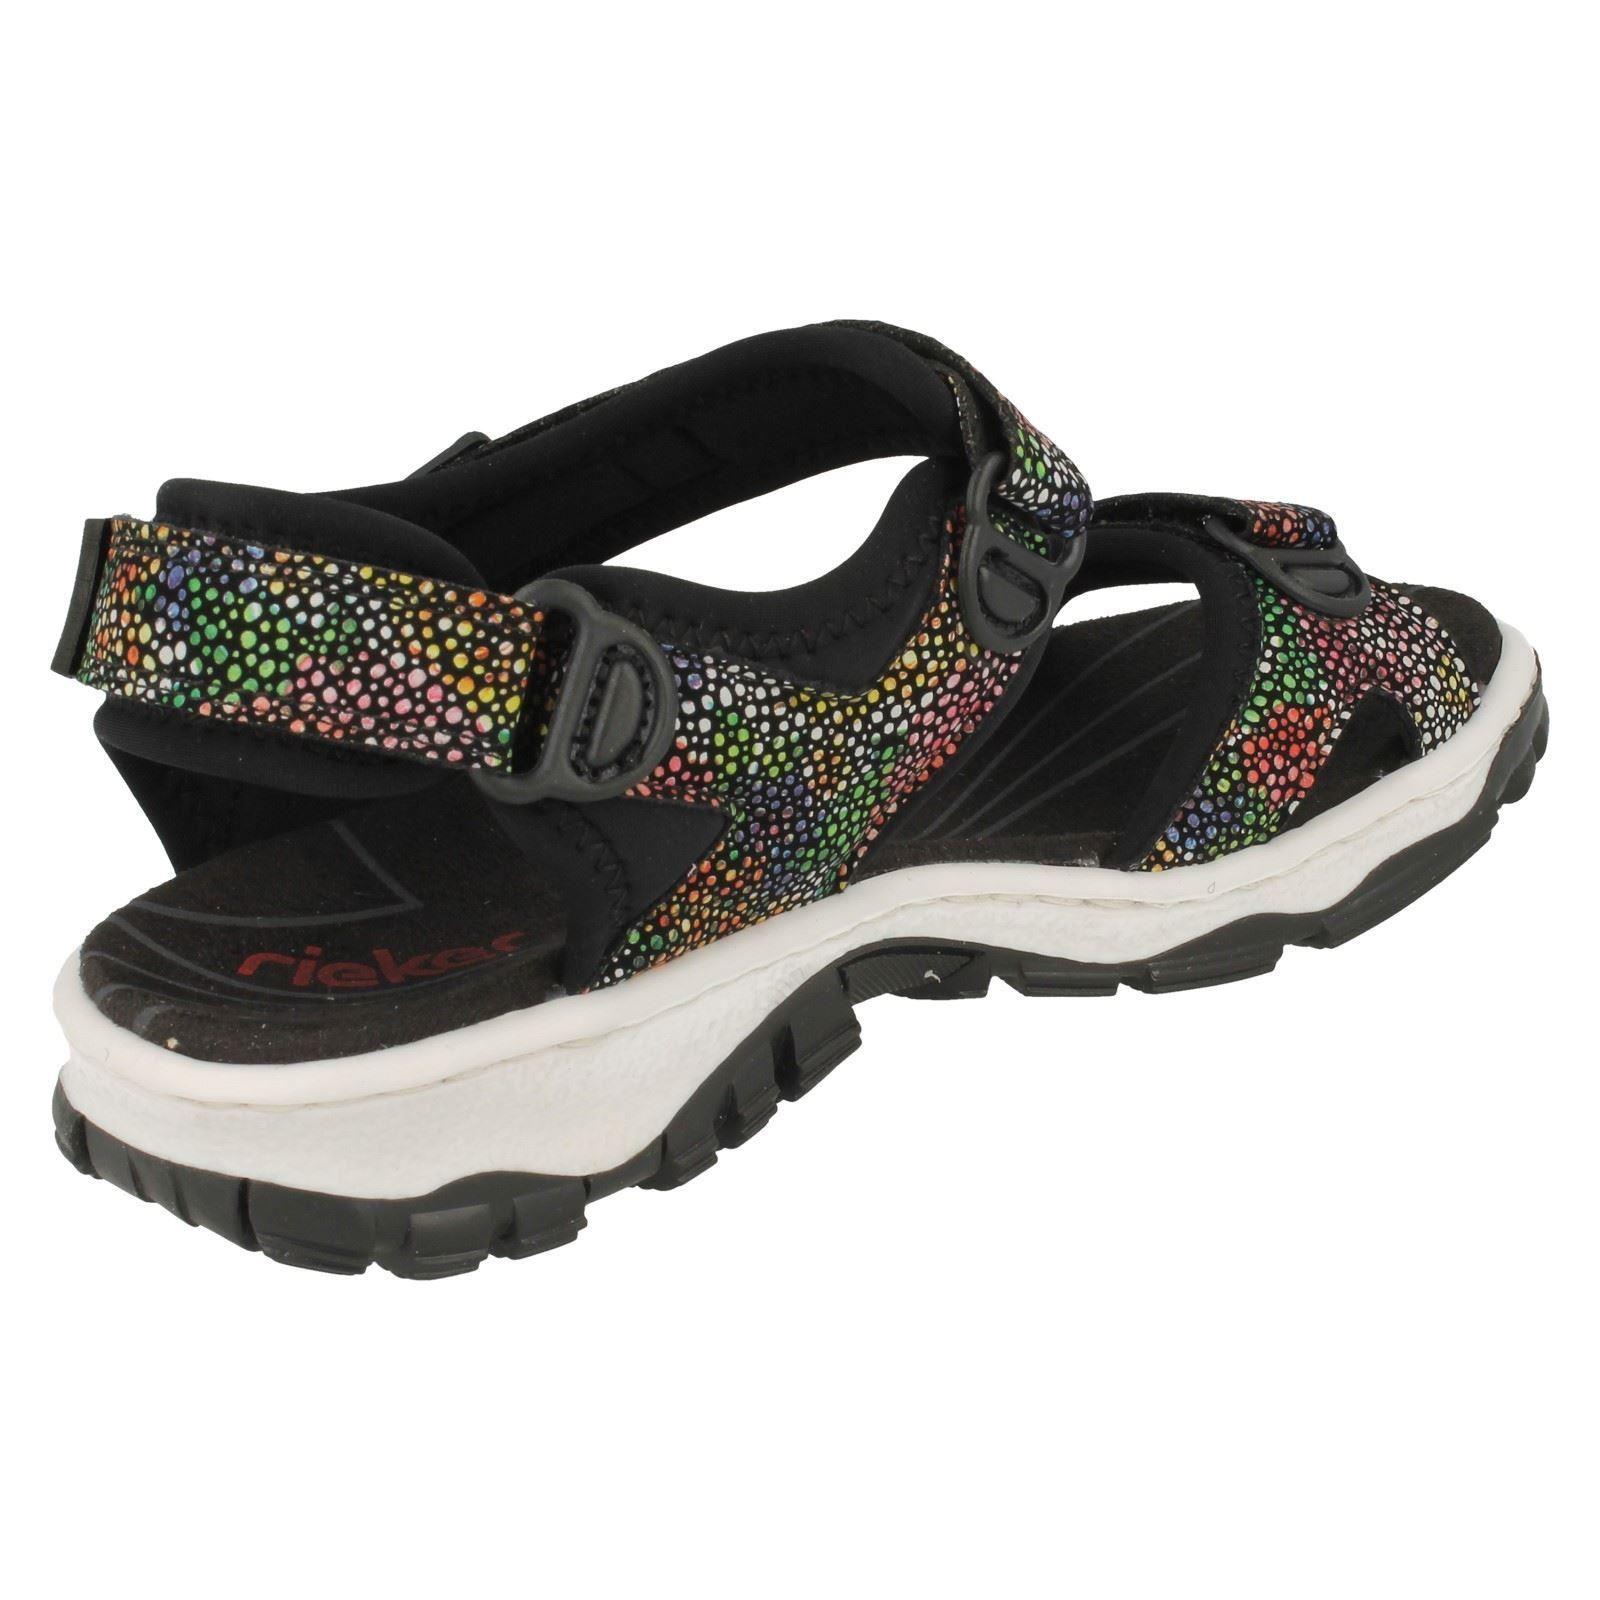 Combi Rieker Black Sandals Ladies 68863 HwIxdRtO